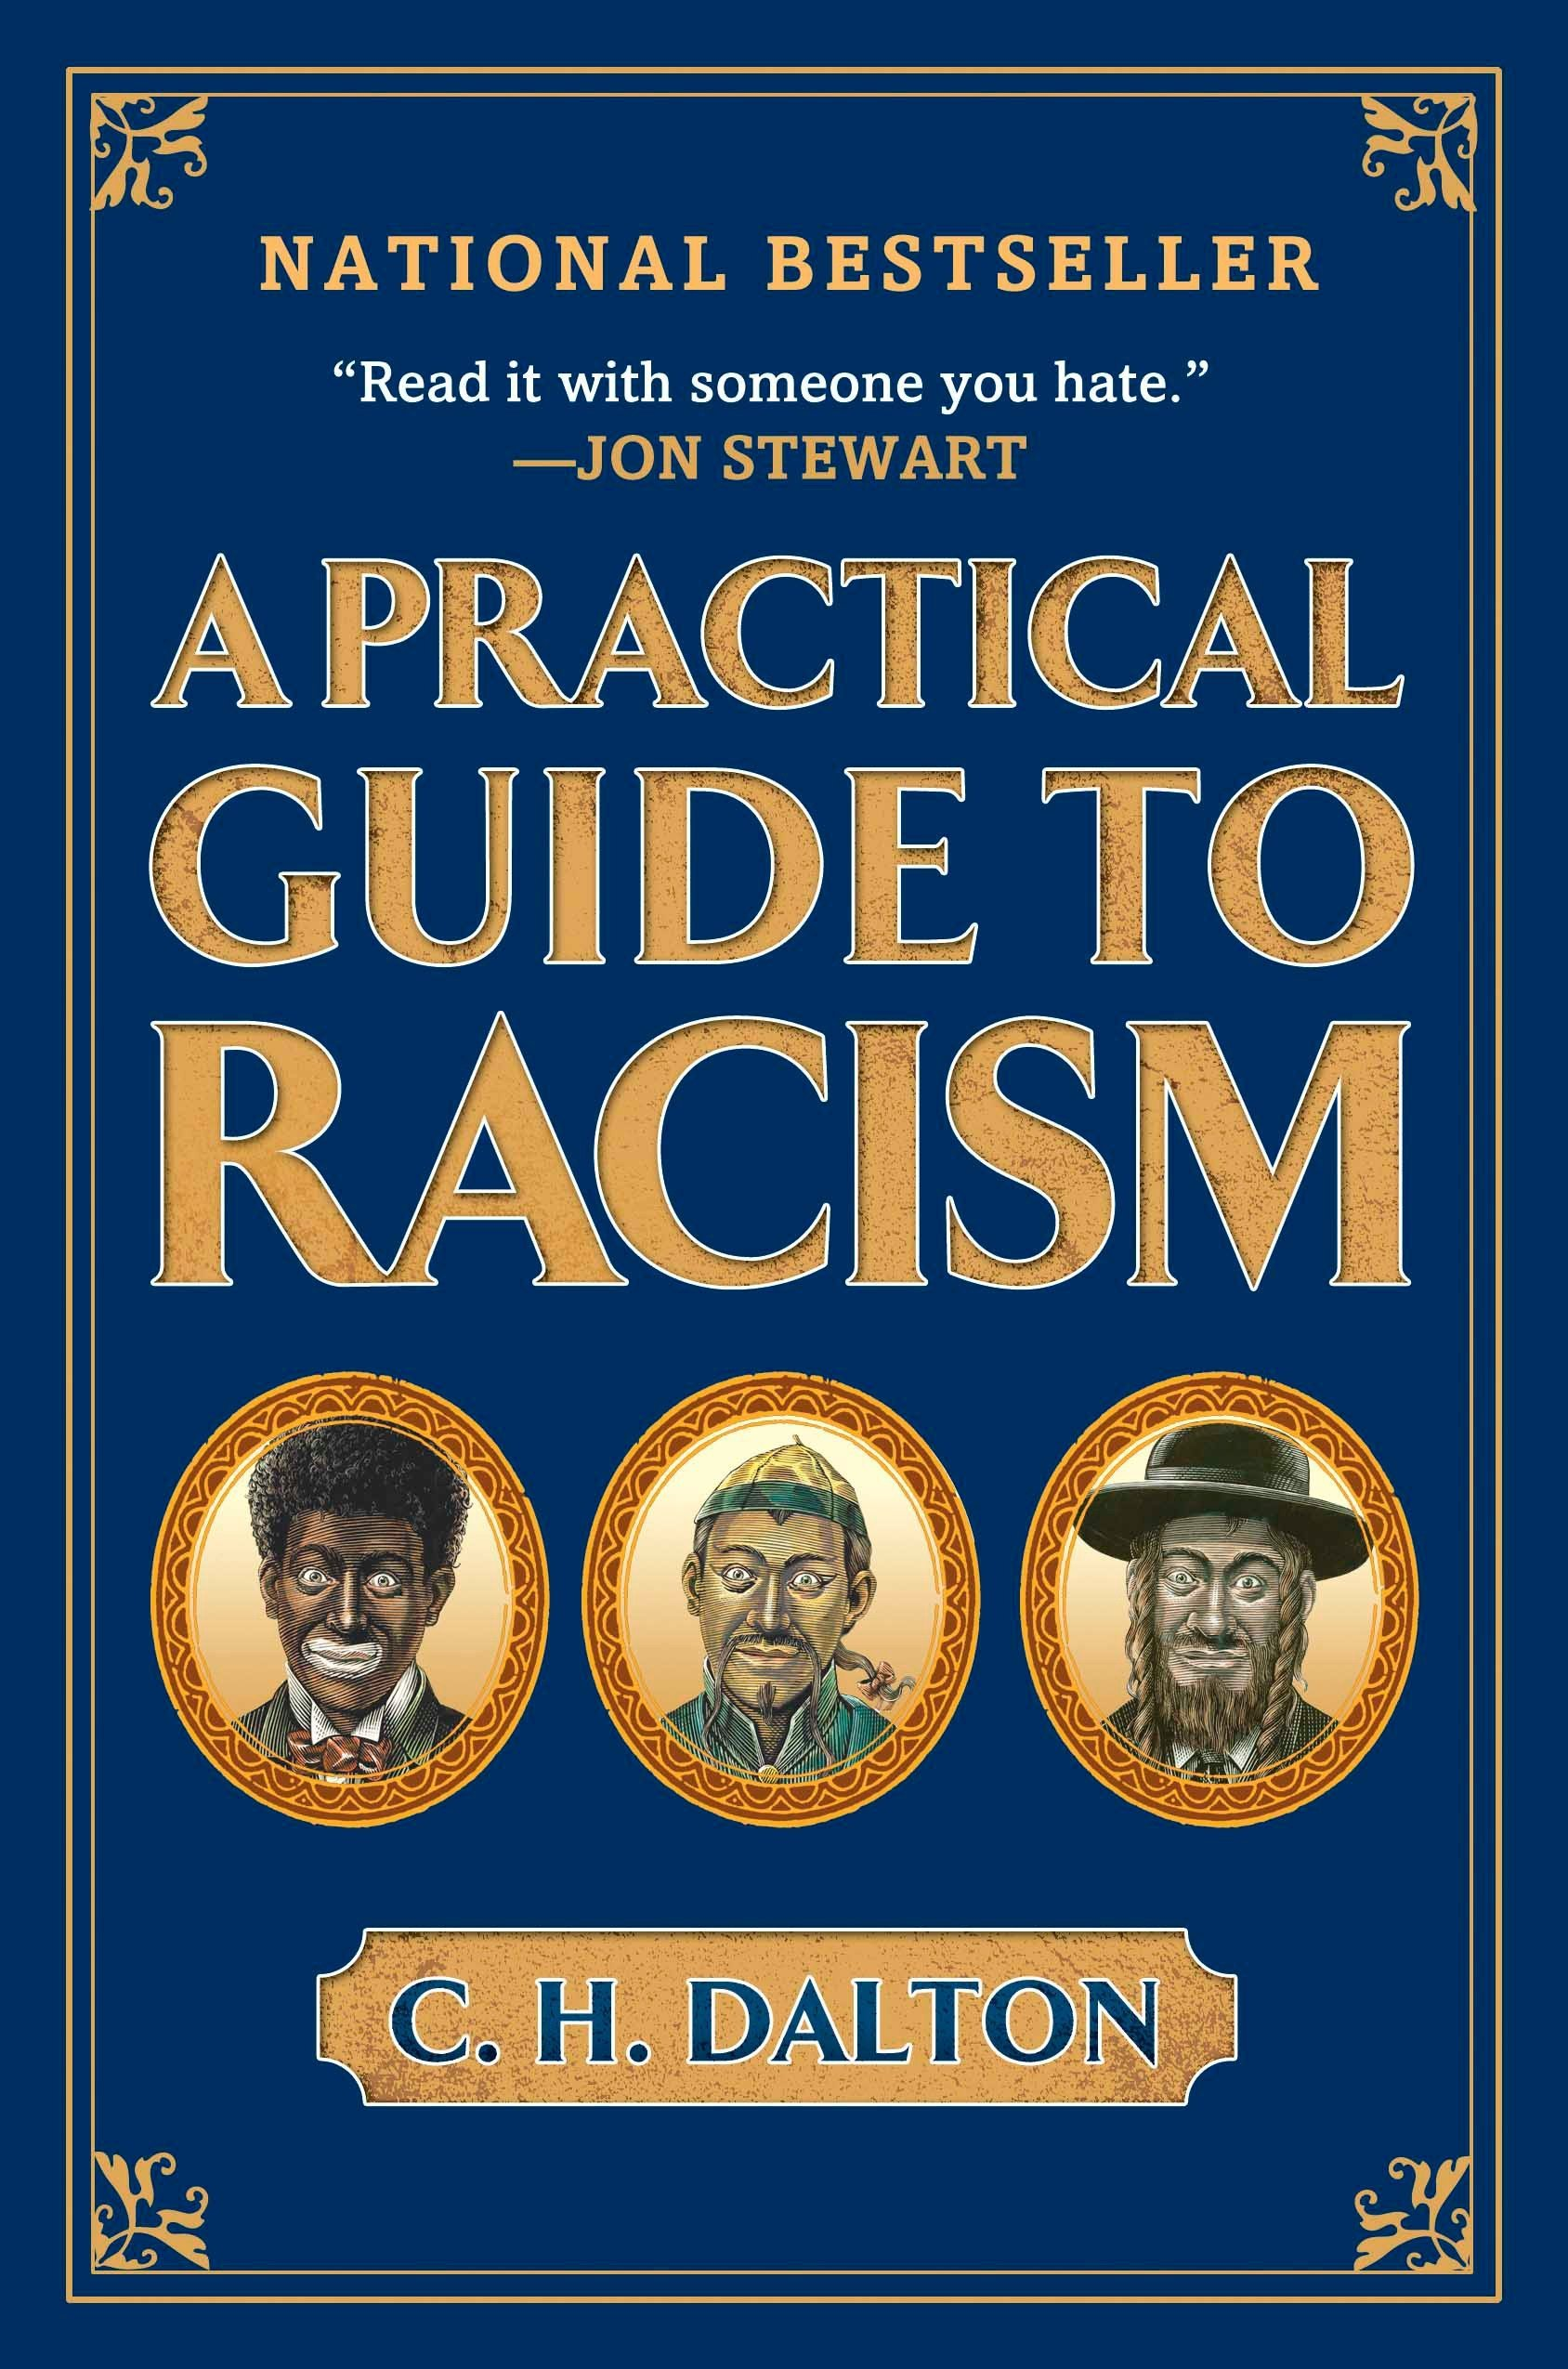 A Practical Guide To Racism C H Dalton 8601200649086 Amazon